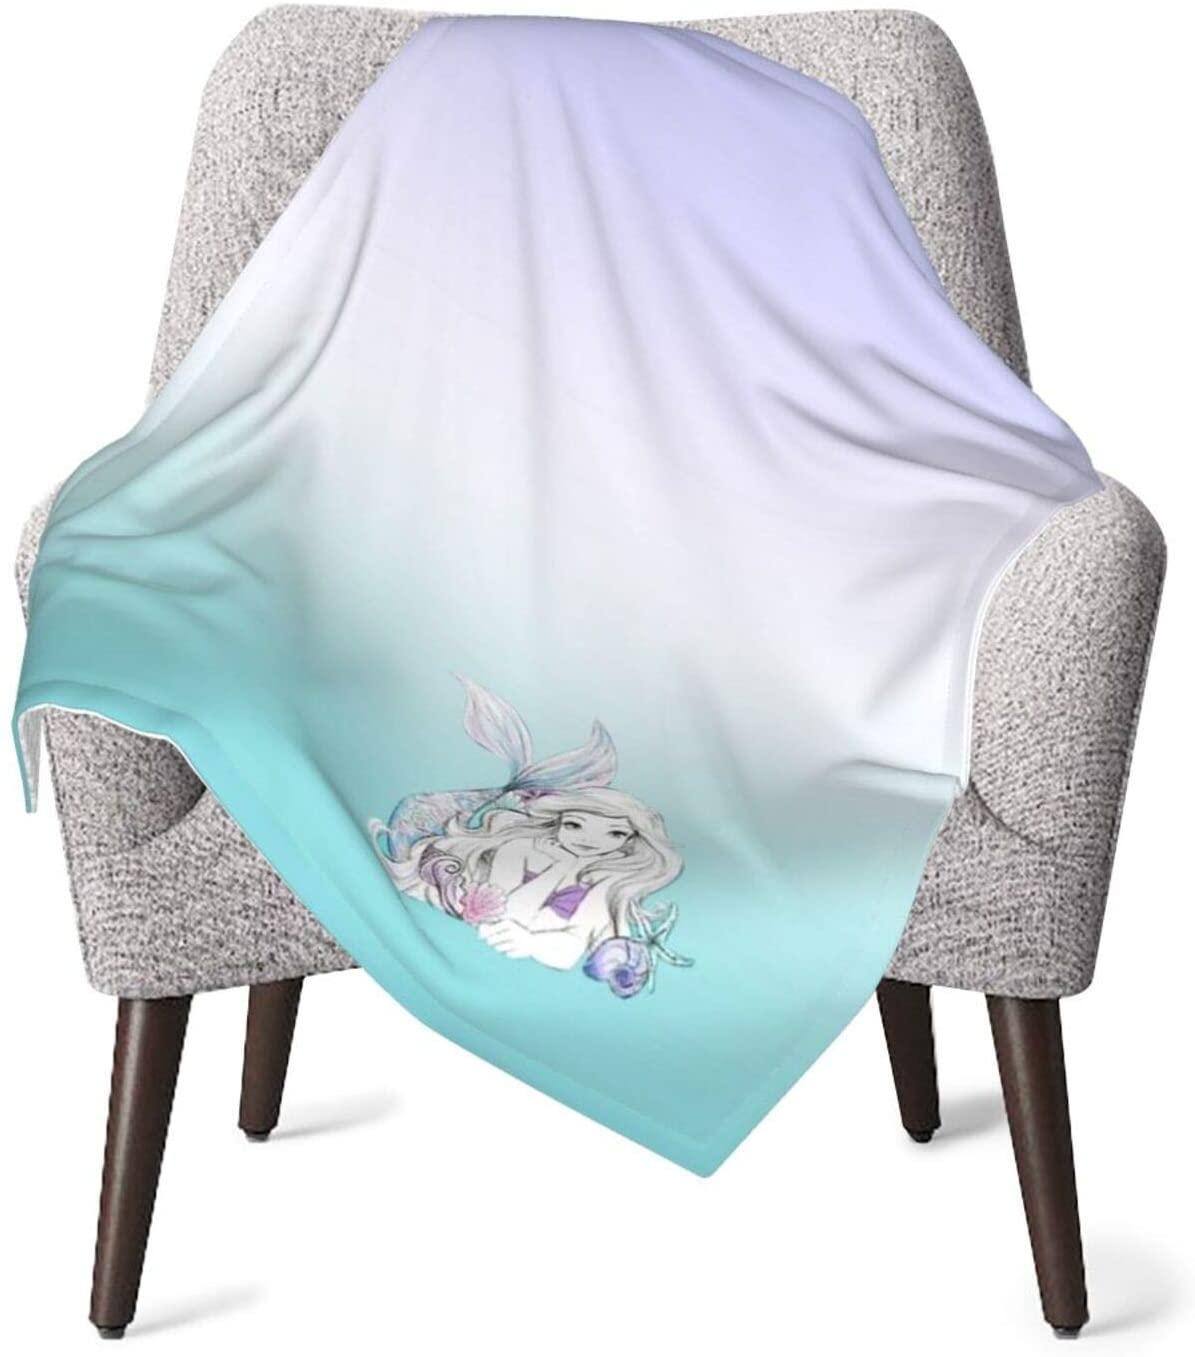 Blanket for Baby Boy Or Girls-Little Cute Mermaid Thermal Baby Blanket Toddler Nap Mat Bed Blankets-Throw Blanket Travel Blanket Pet Blanket Sleeping Blanket Pad 76x101cm